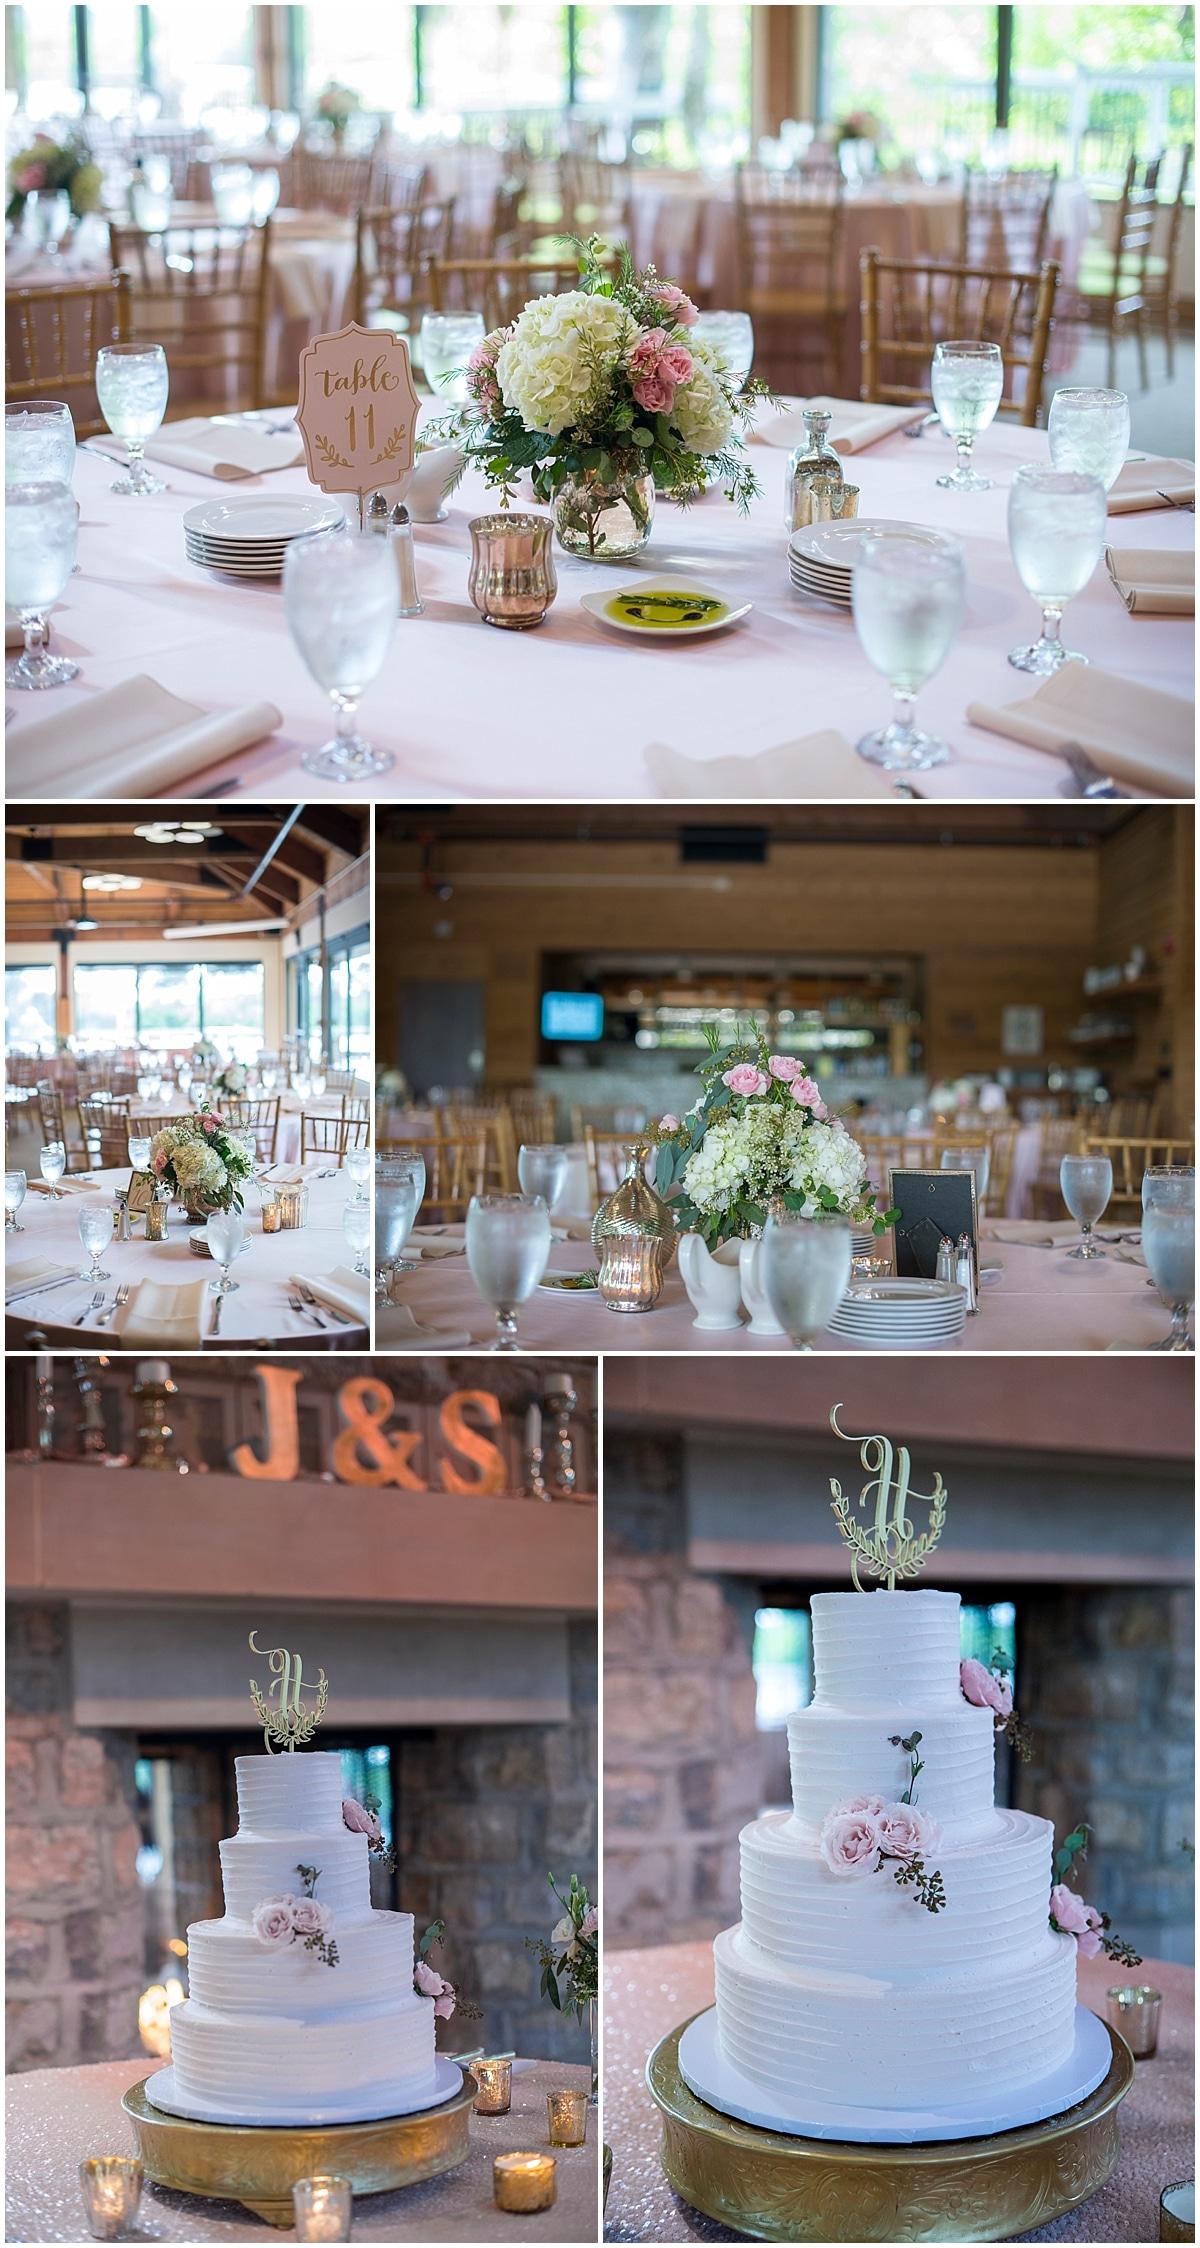 Watersedge event center Wedding Venue Hilliard Ohio